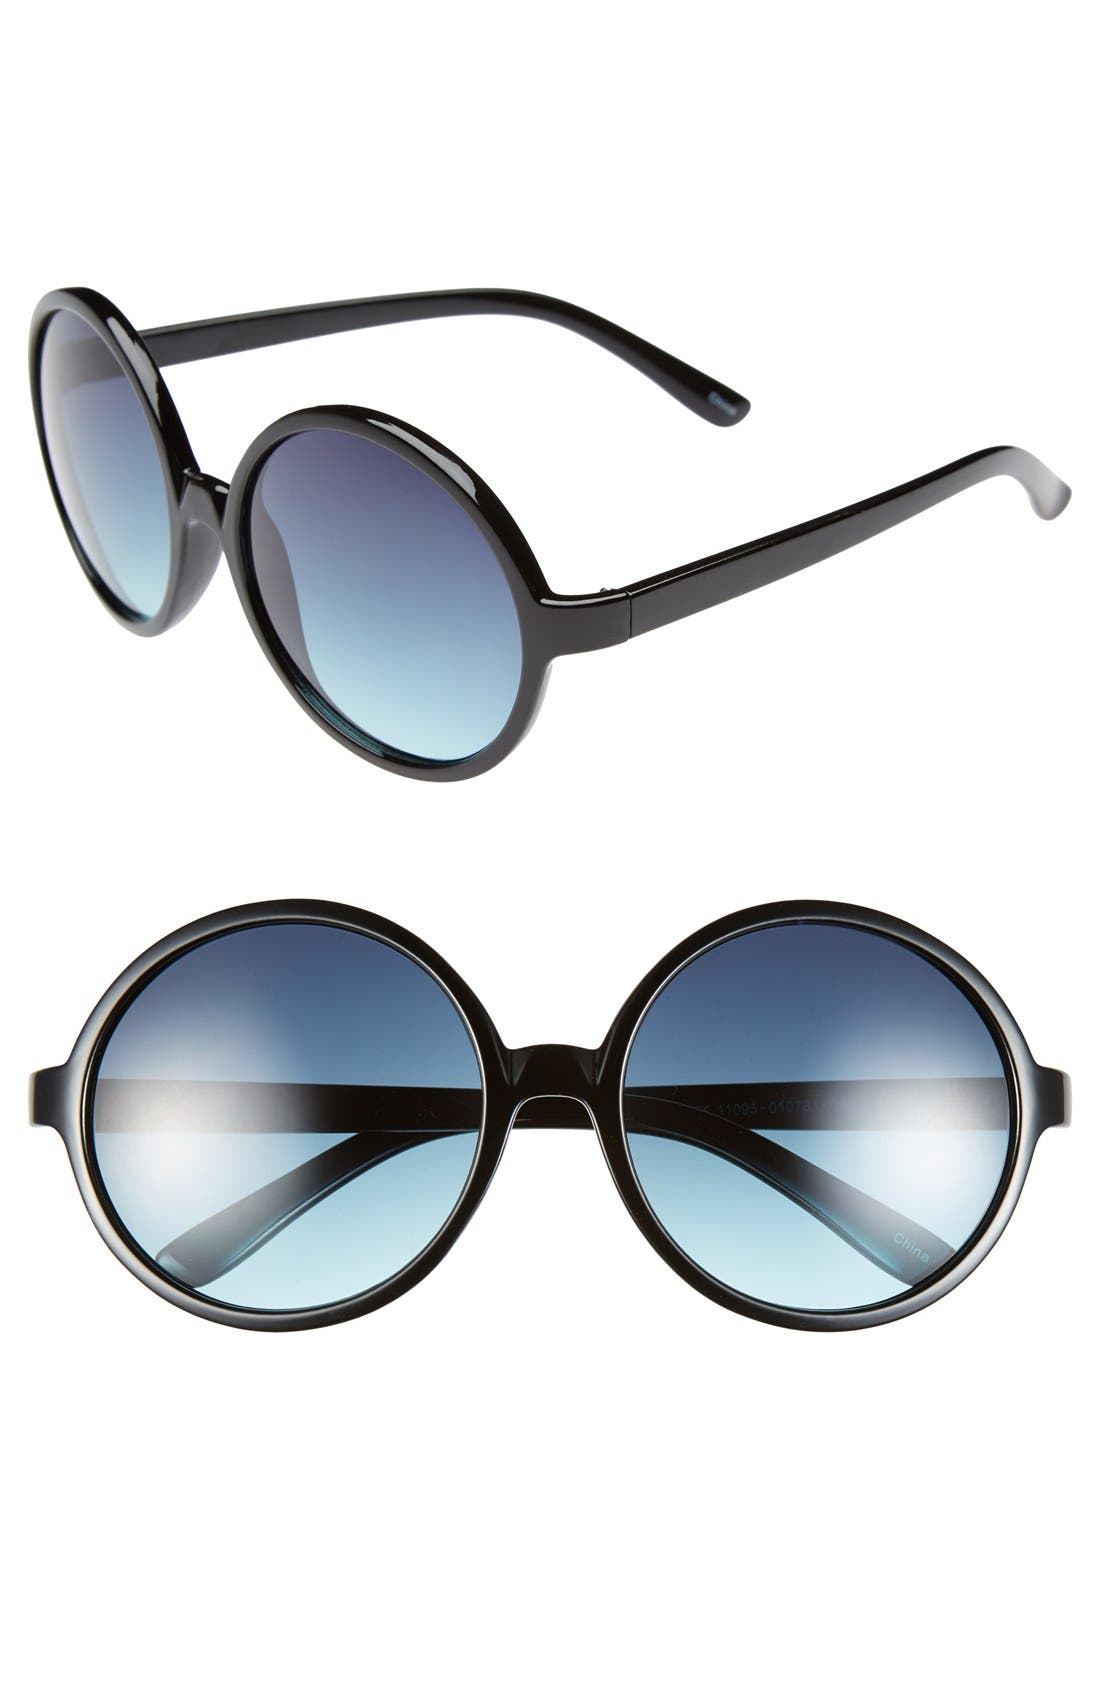 58mm Round Sunglasses,                             Main thumbnail 1, color,                             001